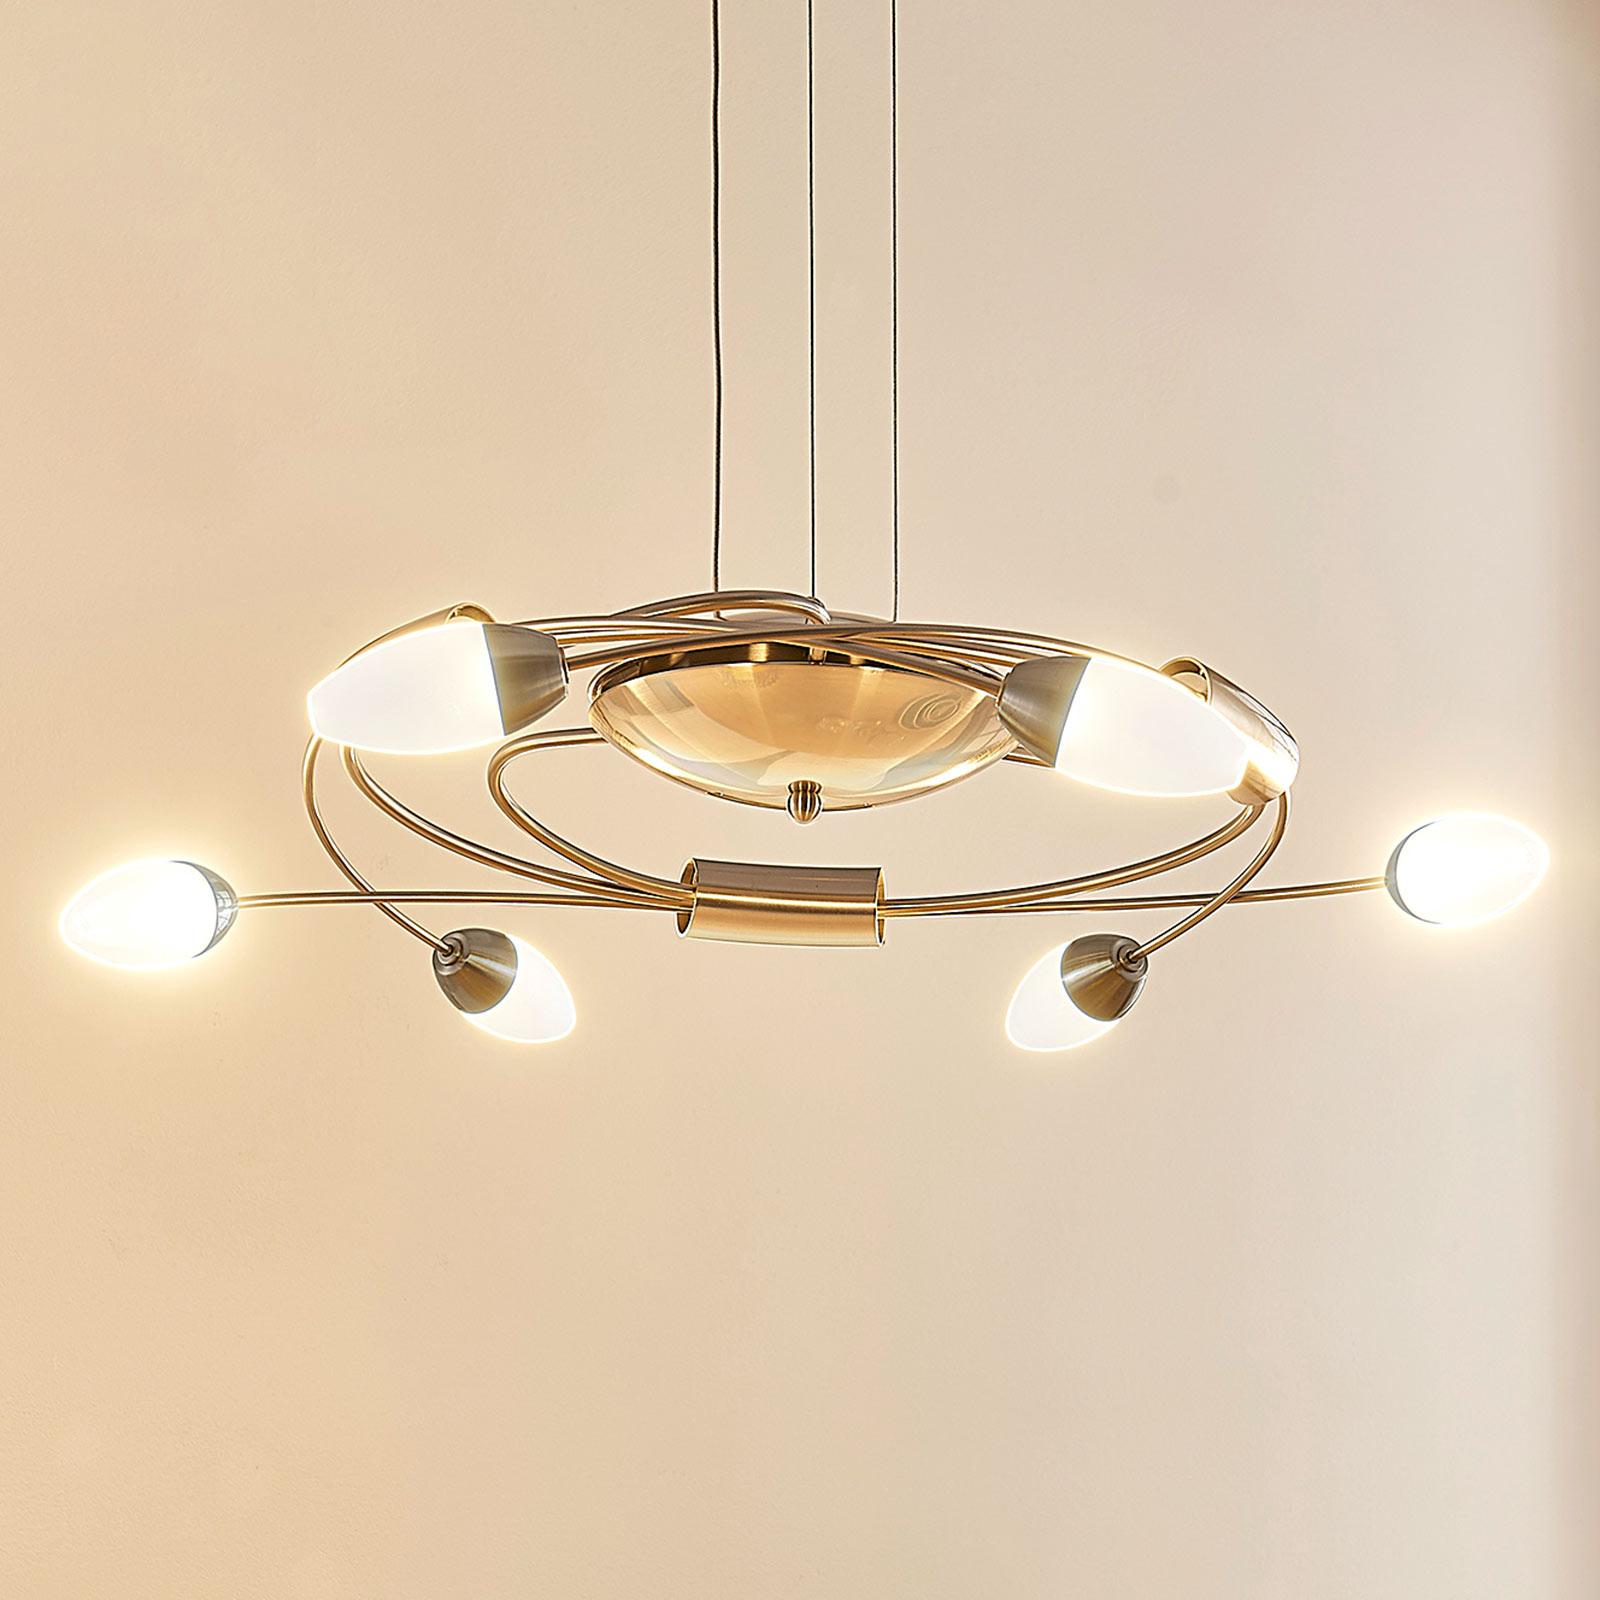 Acquista Lampada LED a sospensione Deyan 6 luci dimmerabile